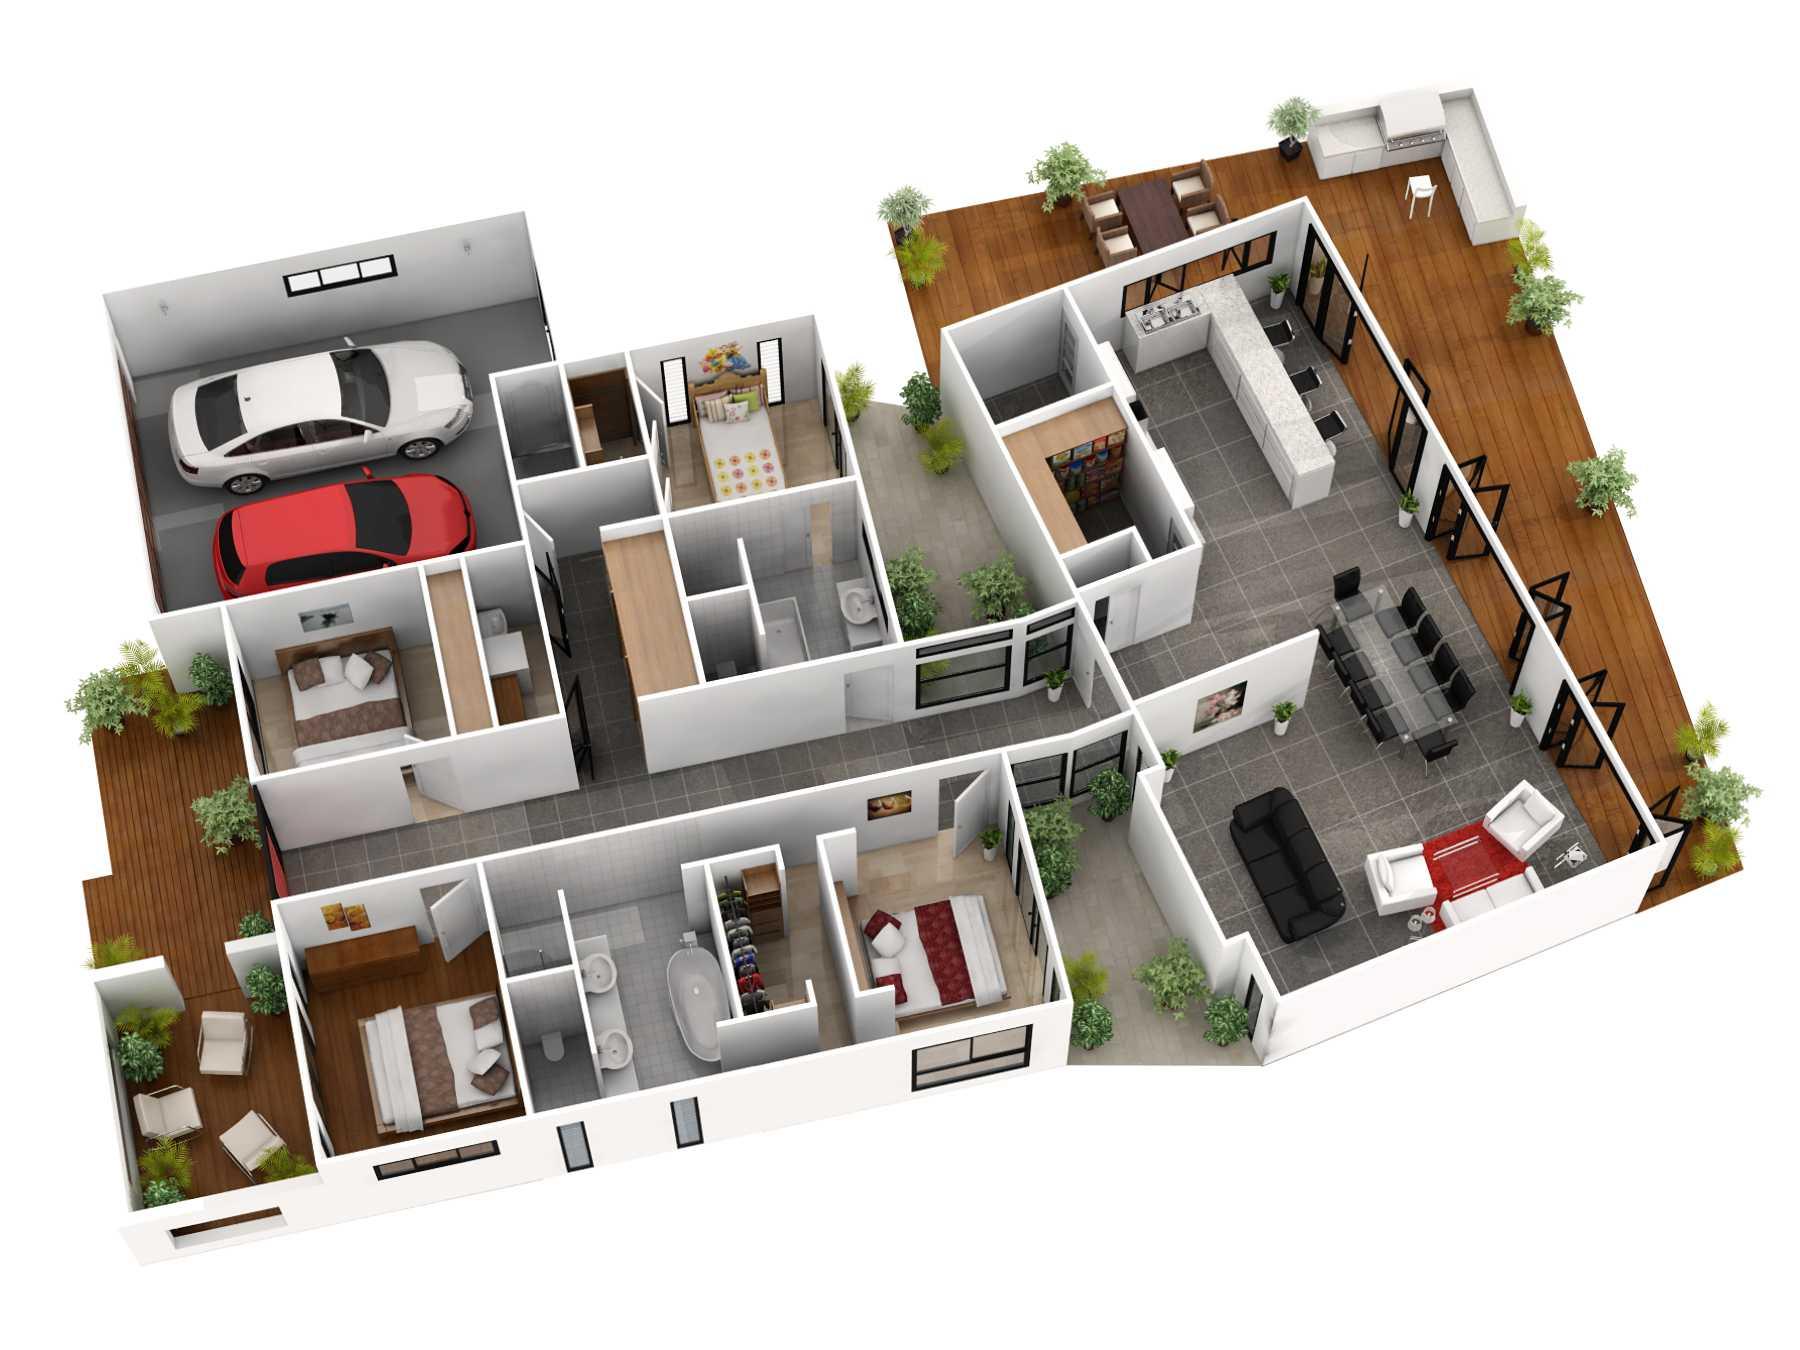 Architecture modern house plans. Architect clipart kid